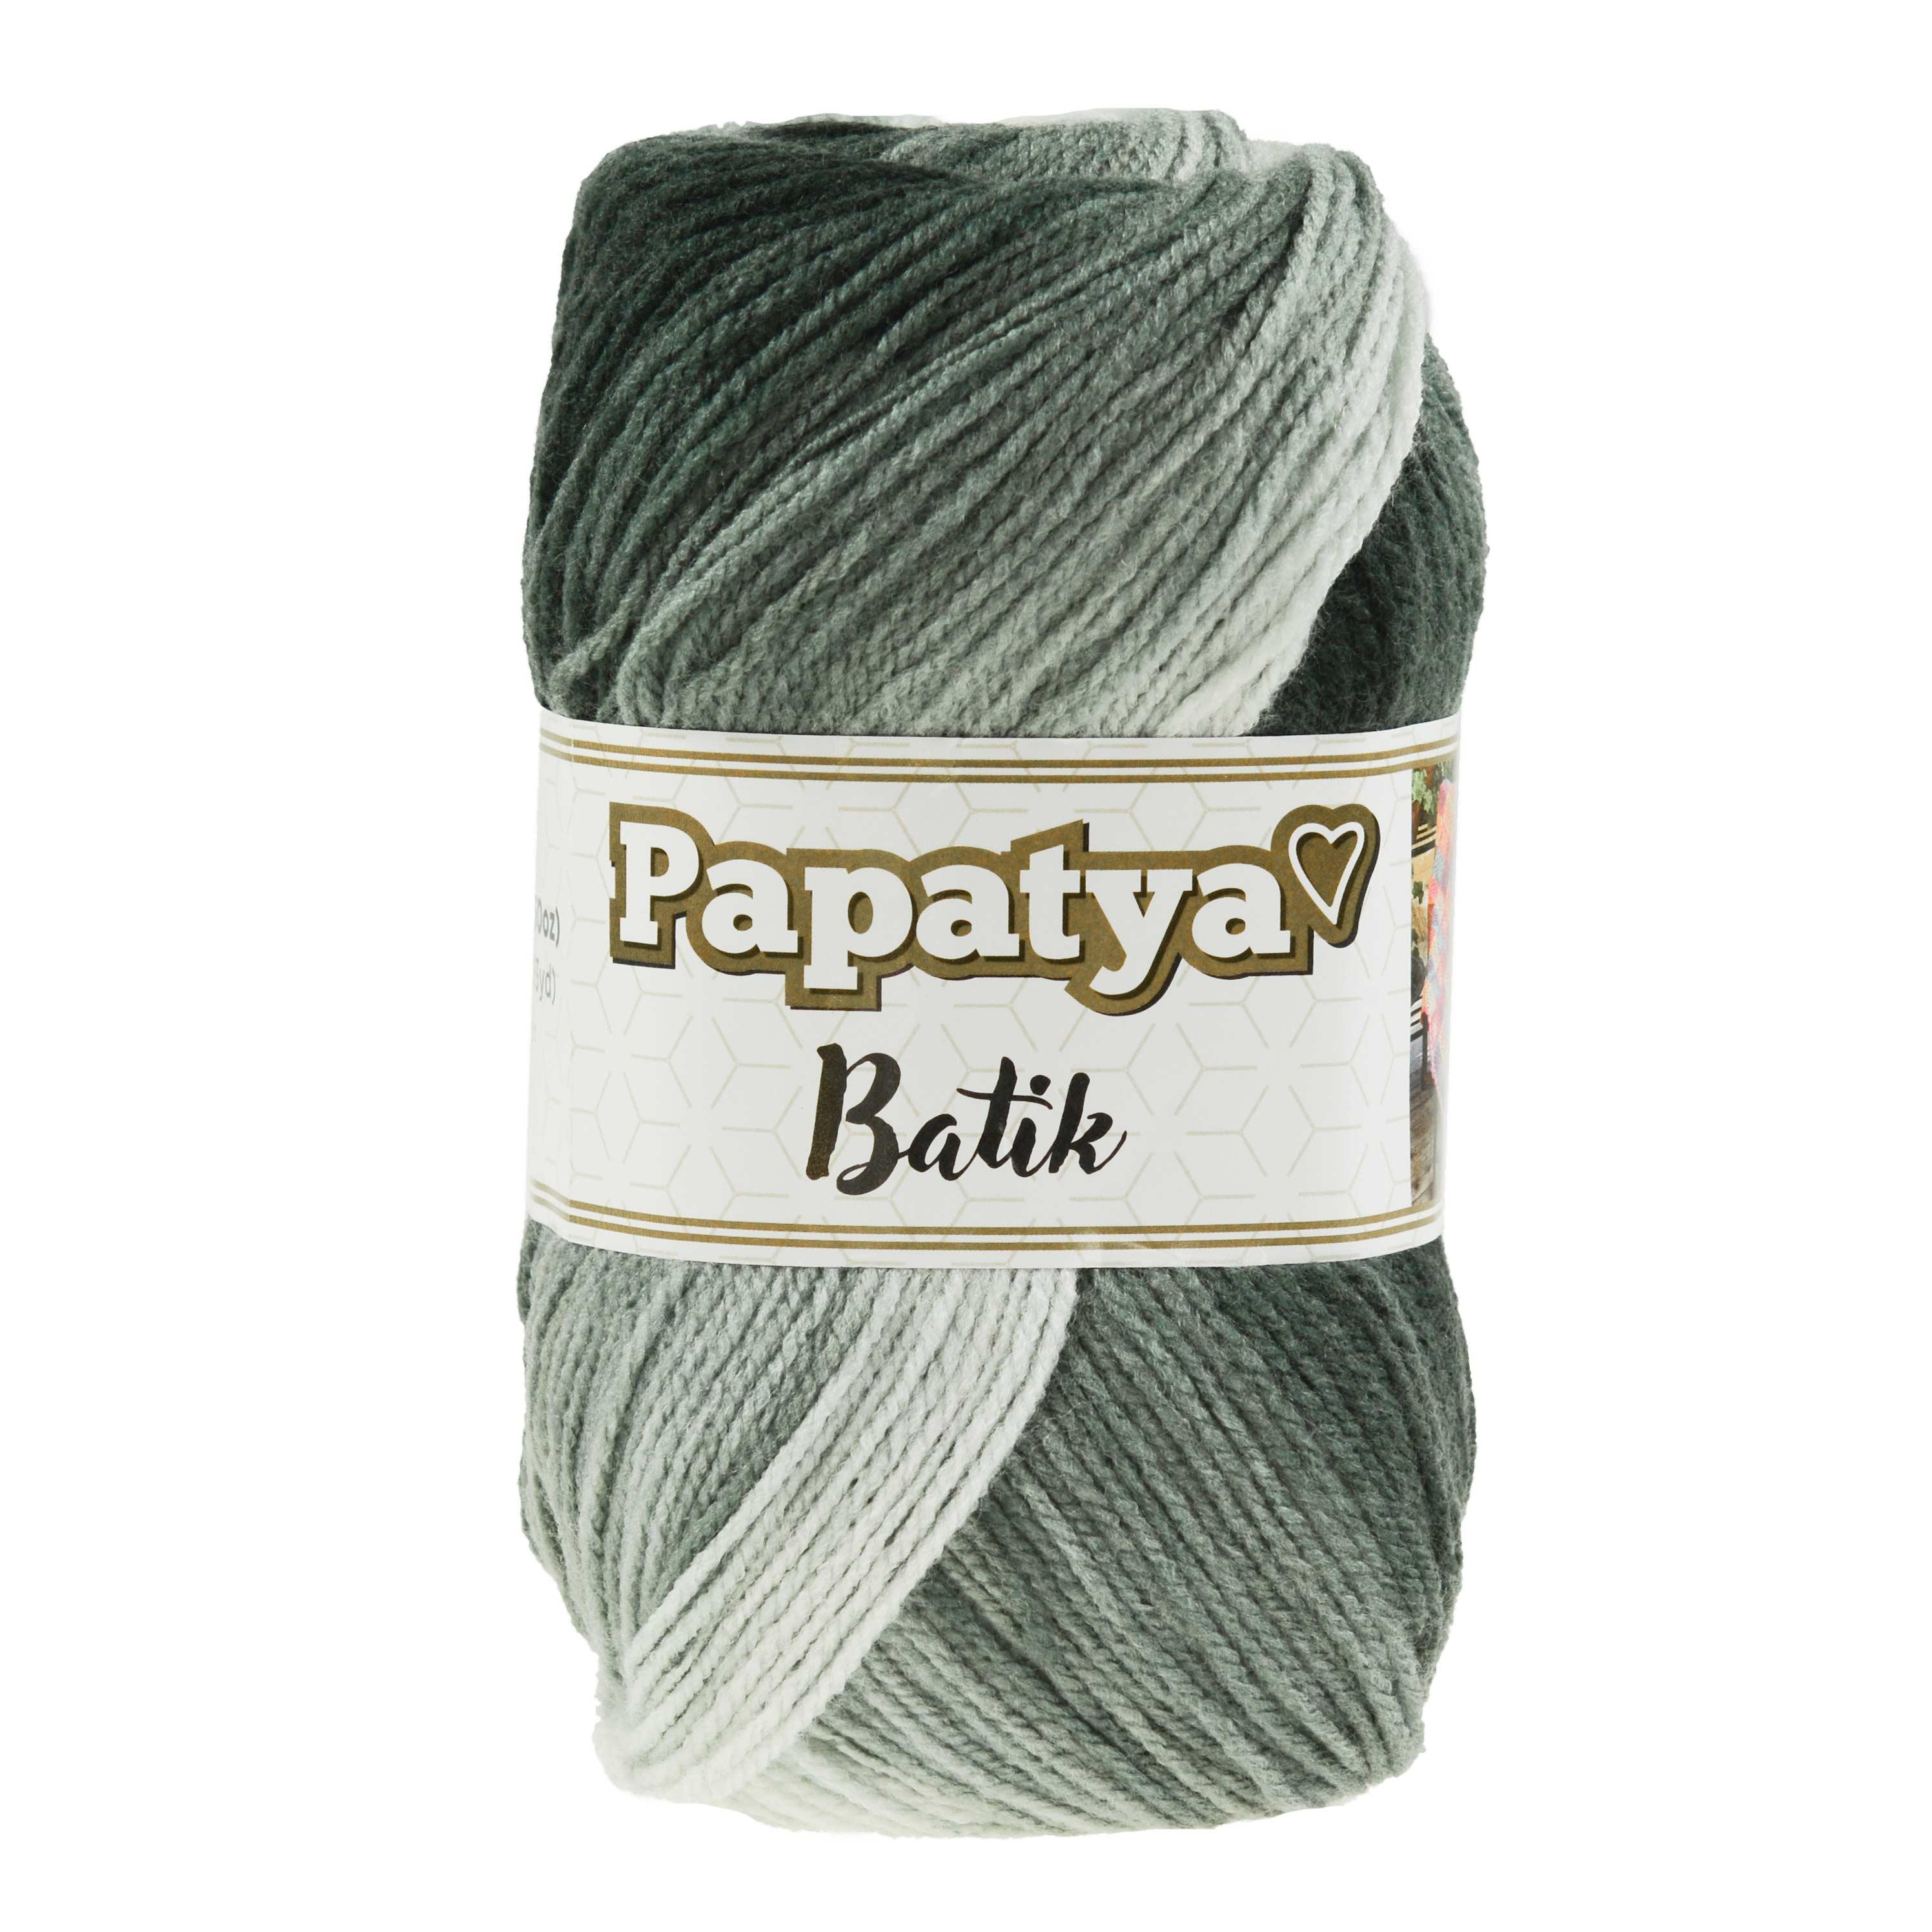 100g Farbverlaufsgarn Papatya Batik Strick-Wolle Strickgarn Häkelgarn Farbwahl – Bild 15